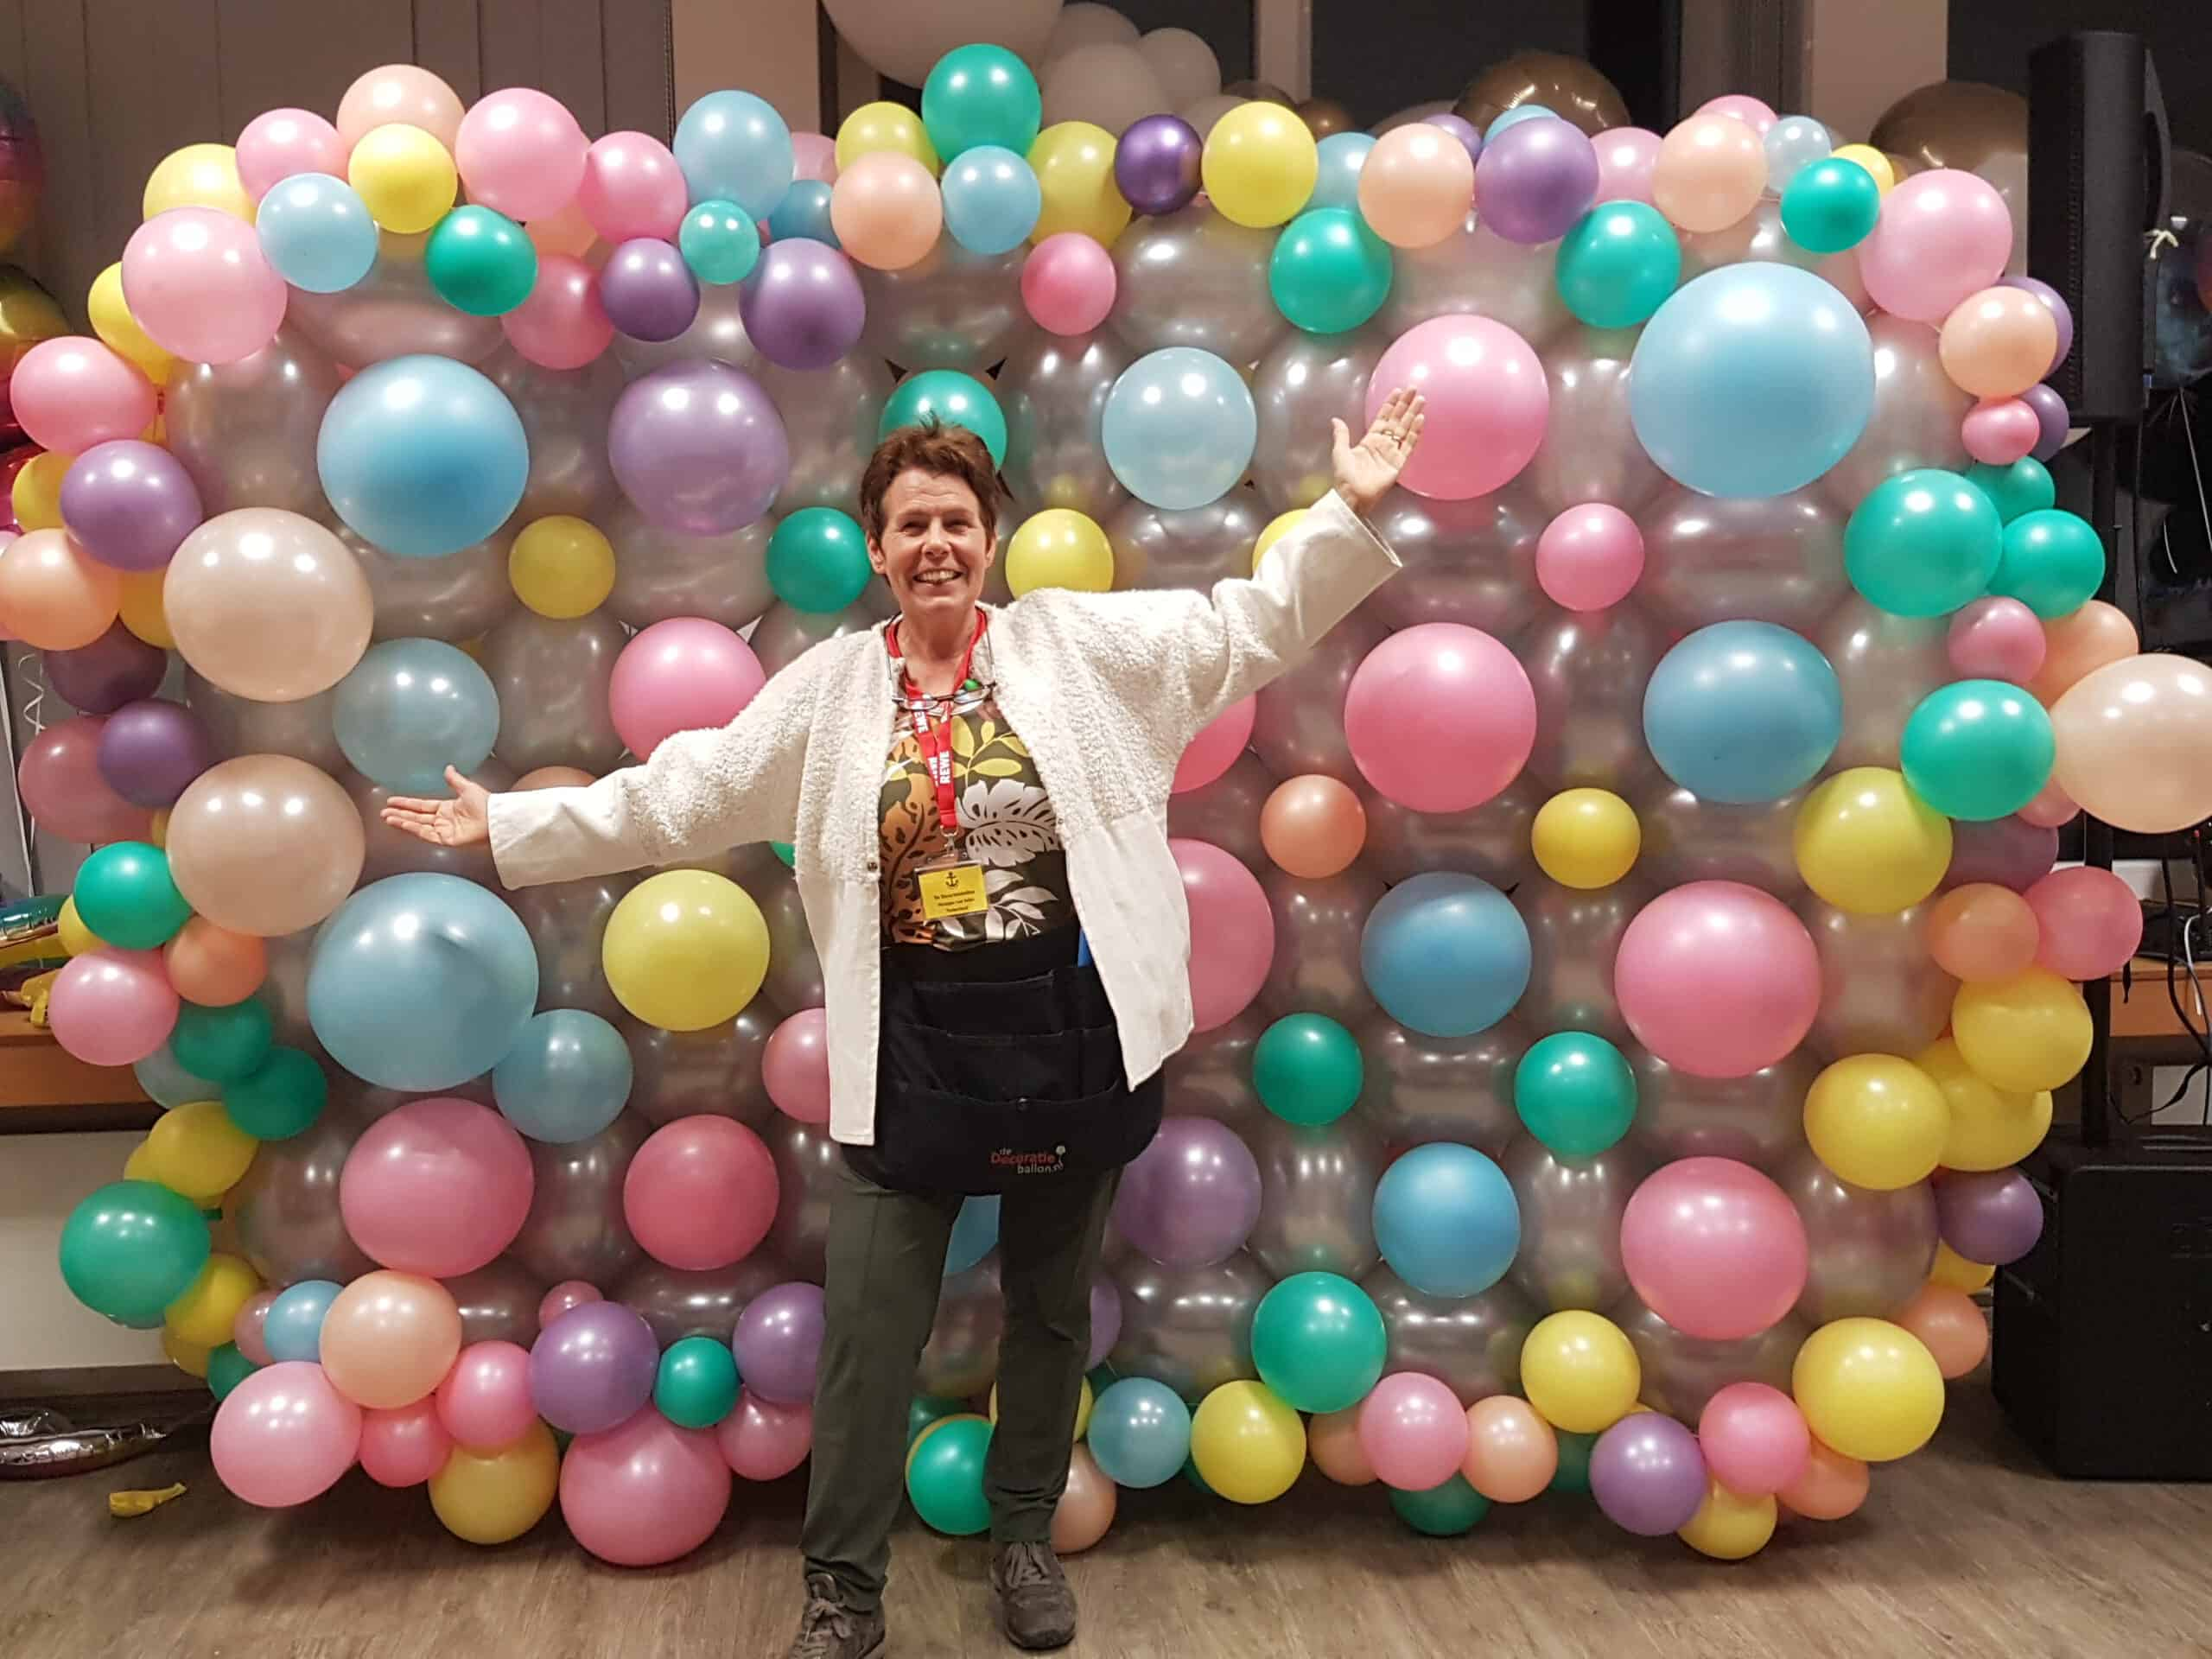 20191106 182819 scaled - Organic ballondecoratie van allerlei maten ballonnen